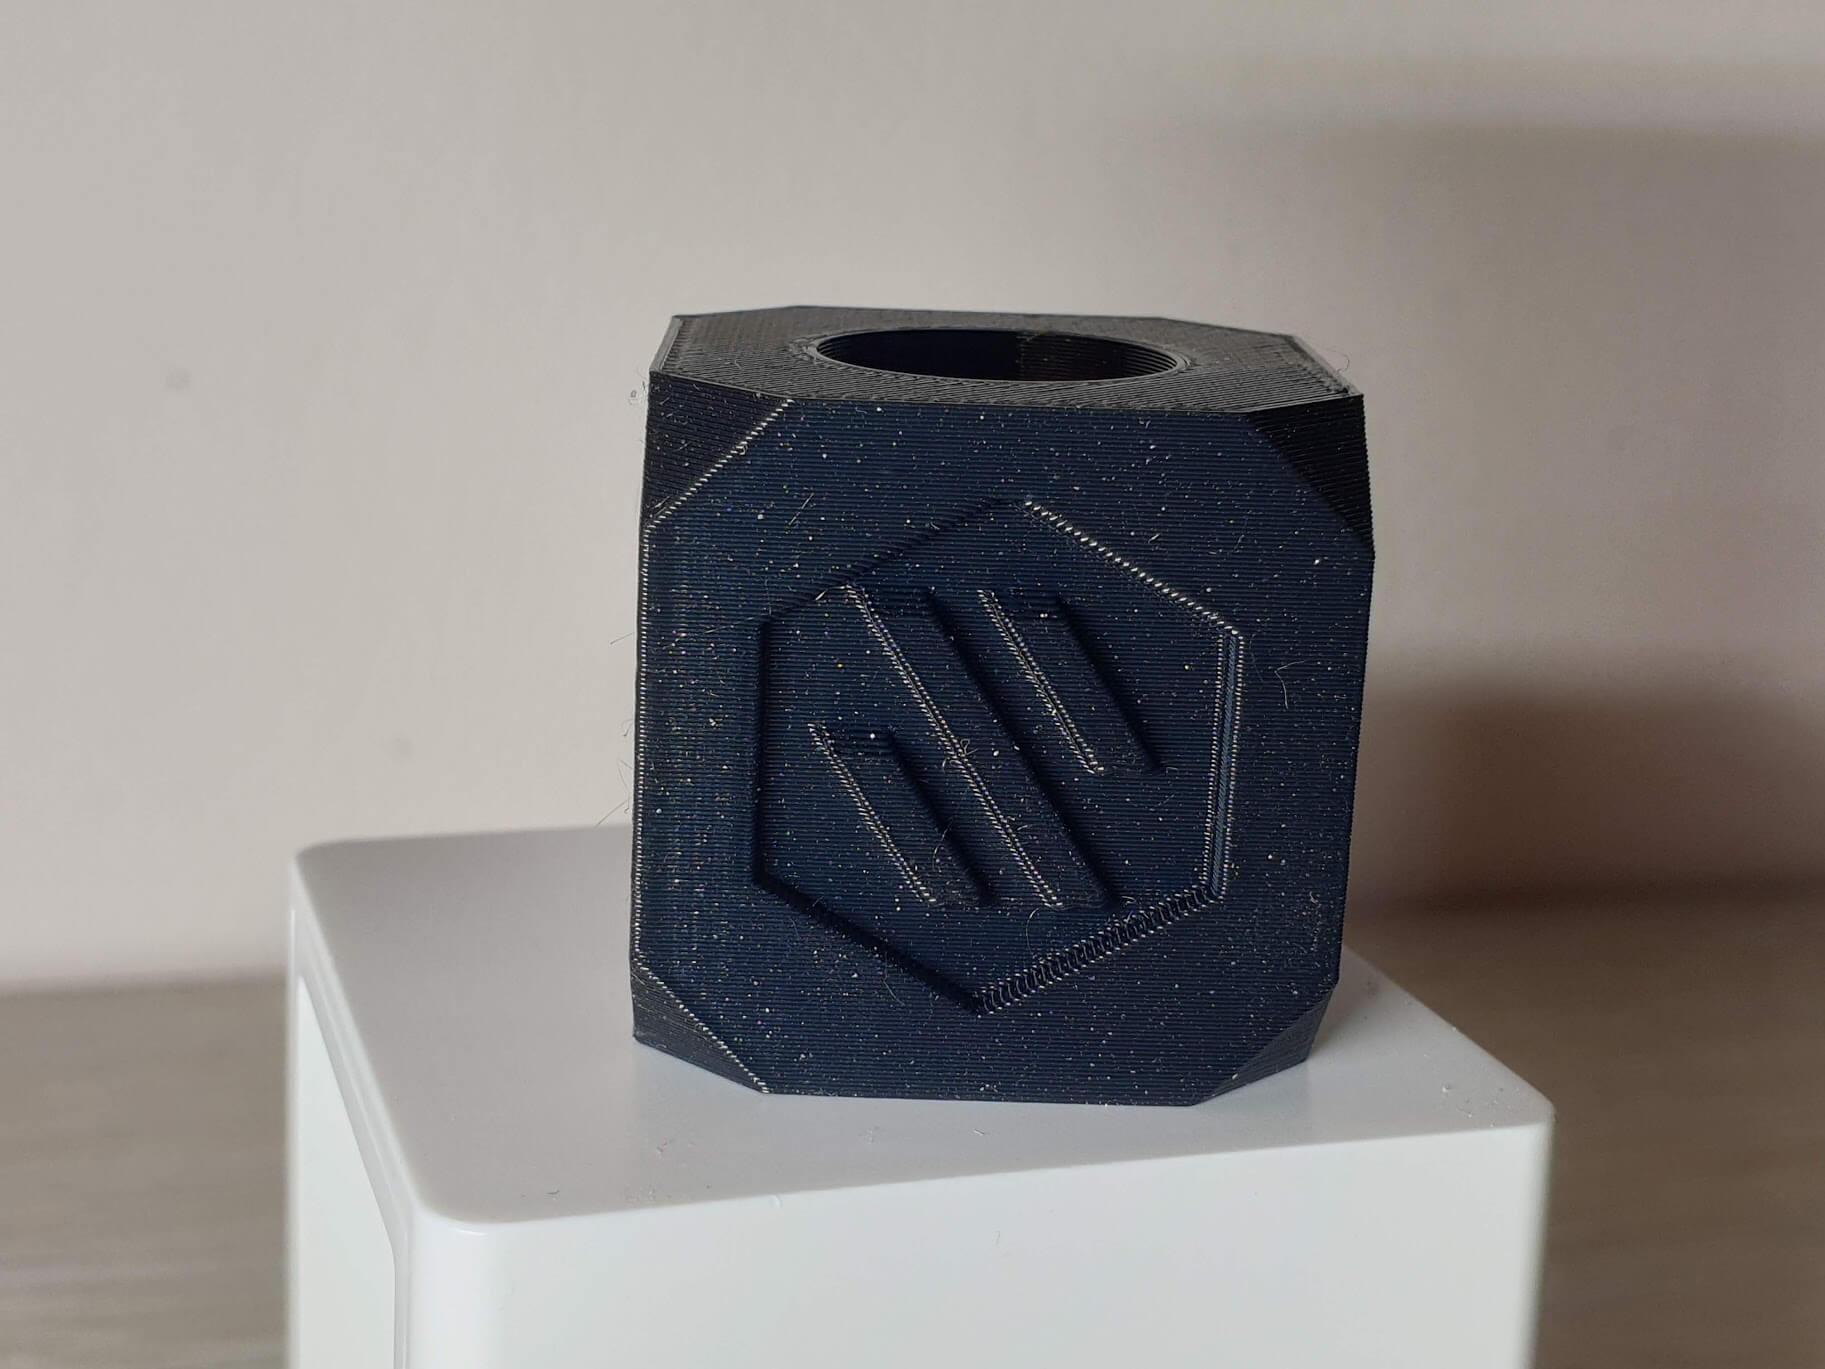 Voron Cube PETG IdeaMaker 3 | IdeaMaker Profiles for Sidewinder X1 and Genius